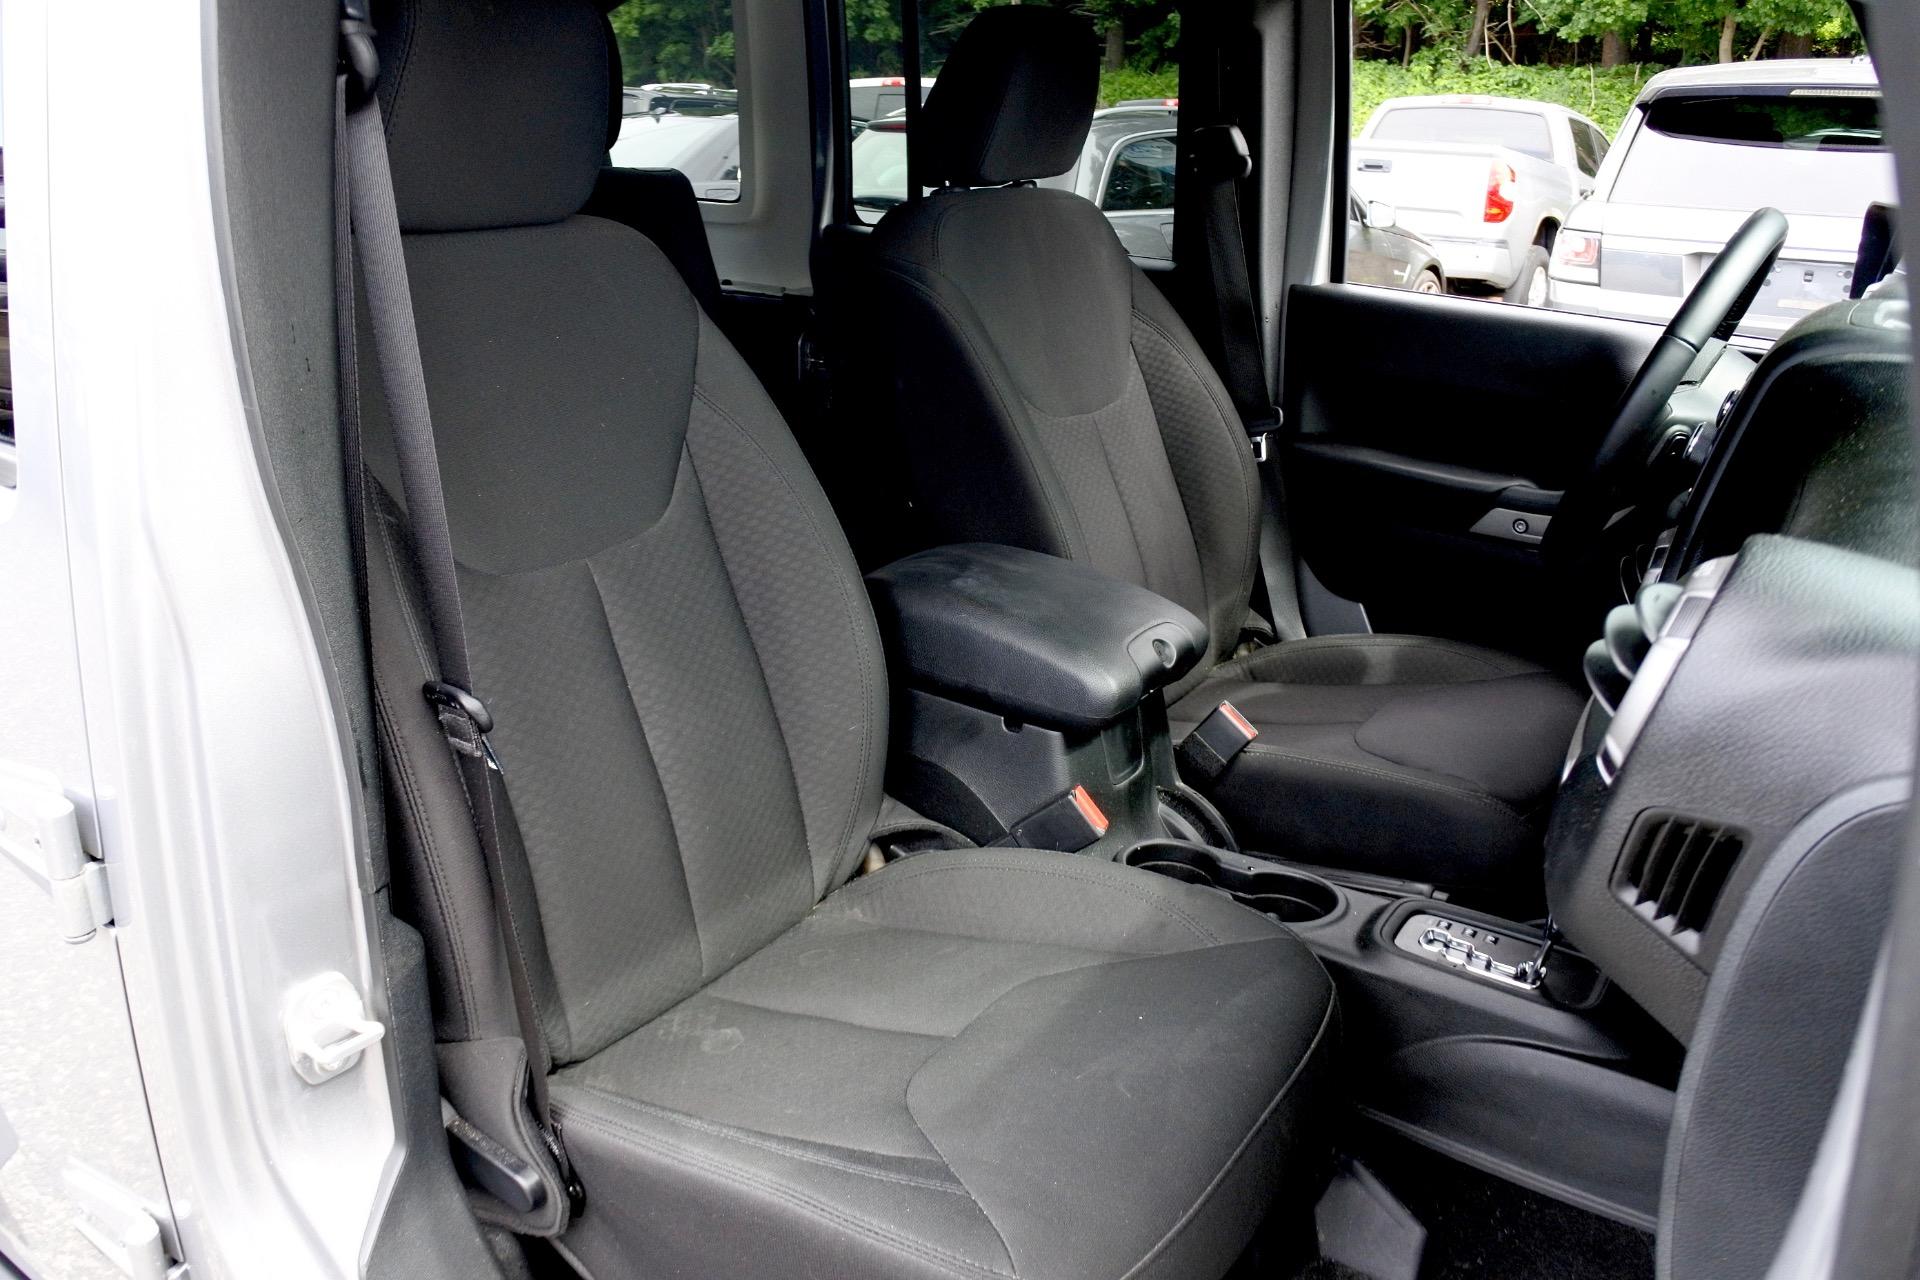 Used 2017 Jeep Wrangler Unlimited Sport 4x4 Used 2017 Jeep Wrangler Unlimited Sport 4x4 for sale  at Metro West Motorcars LLC in Shrewsbury MA 17